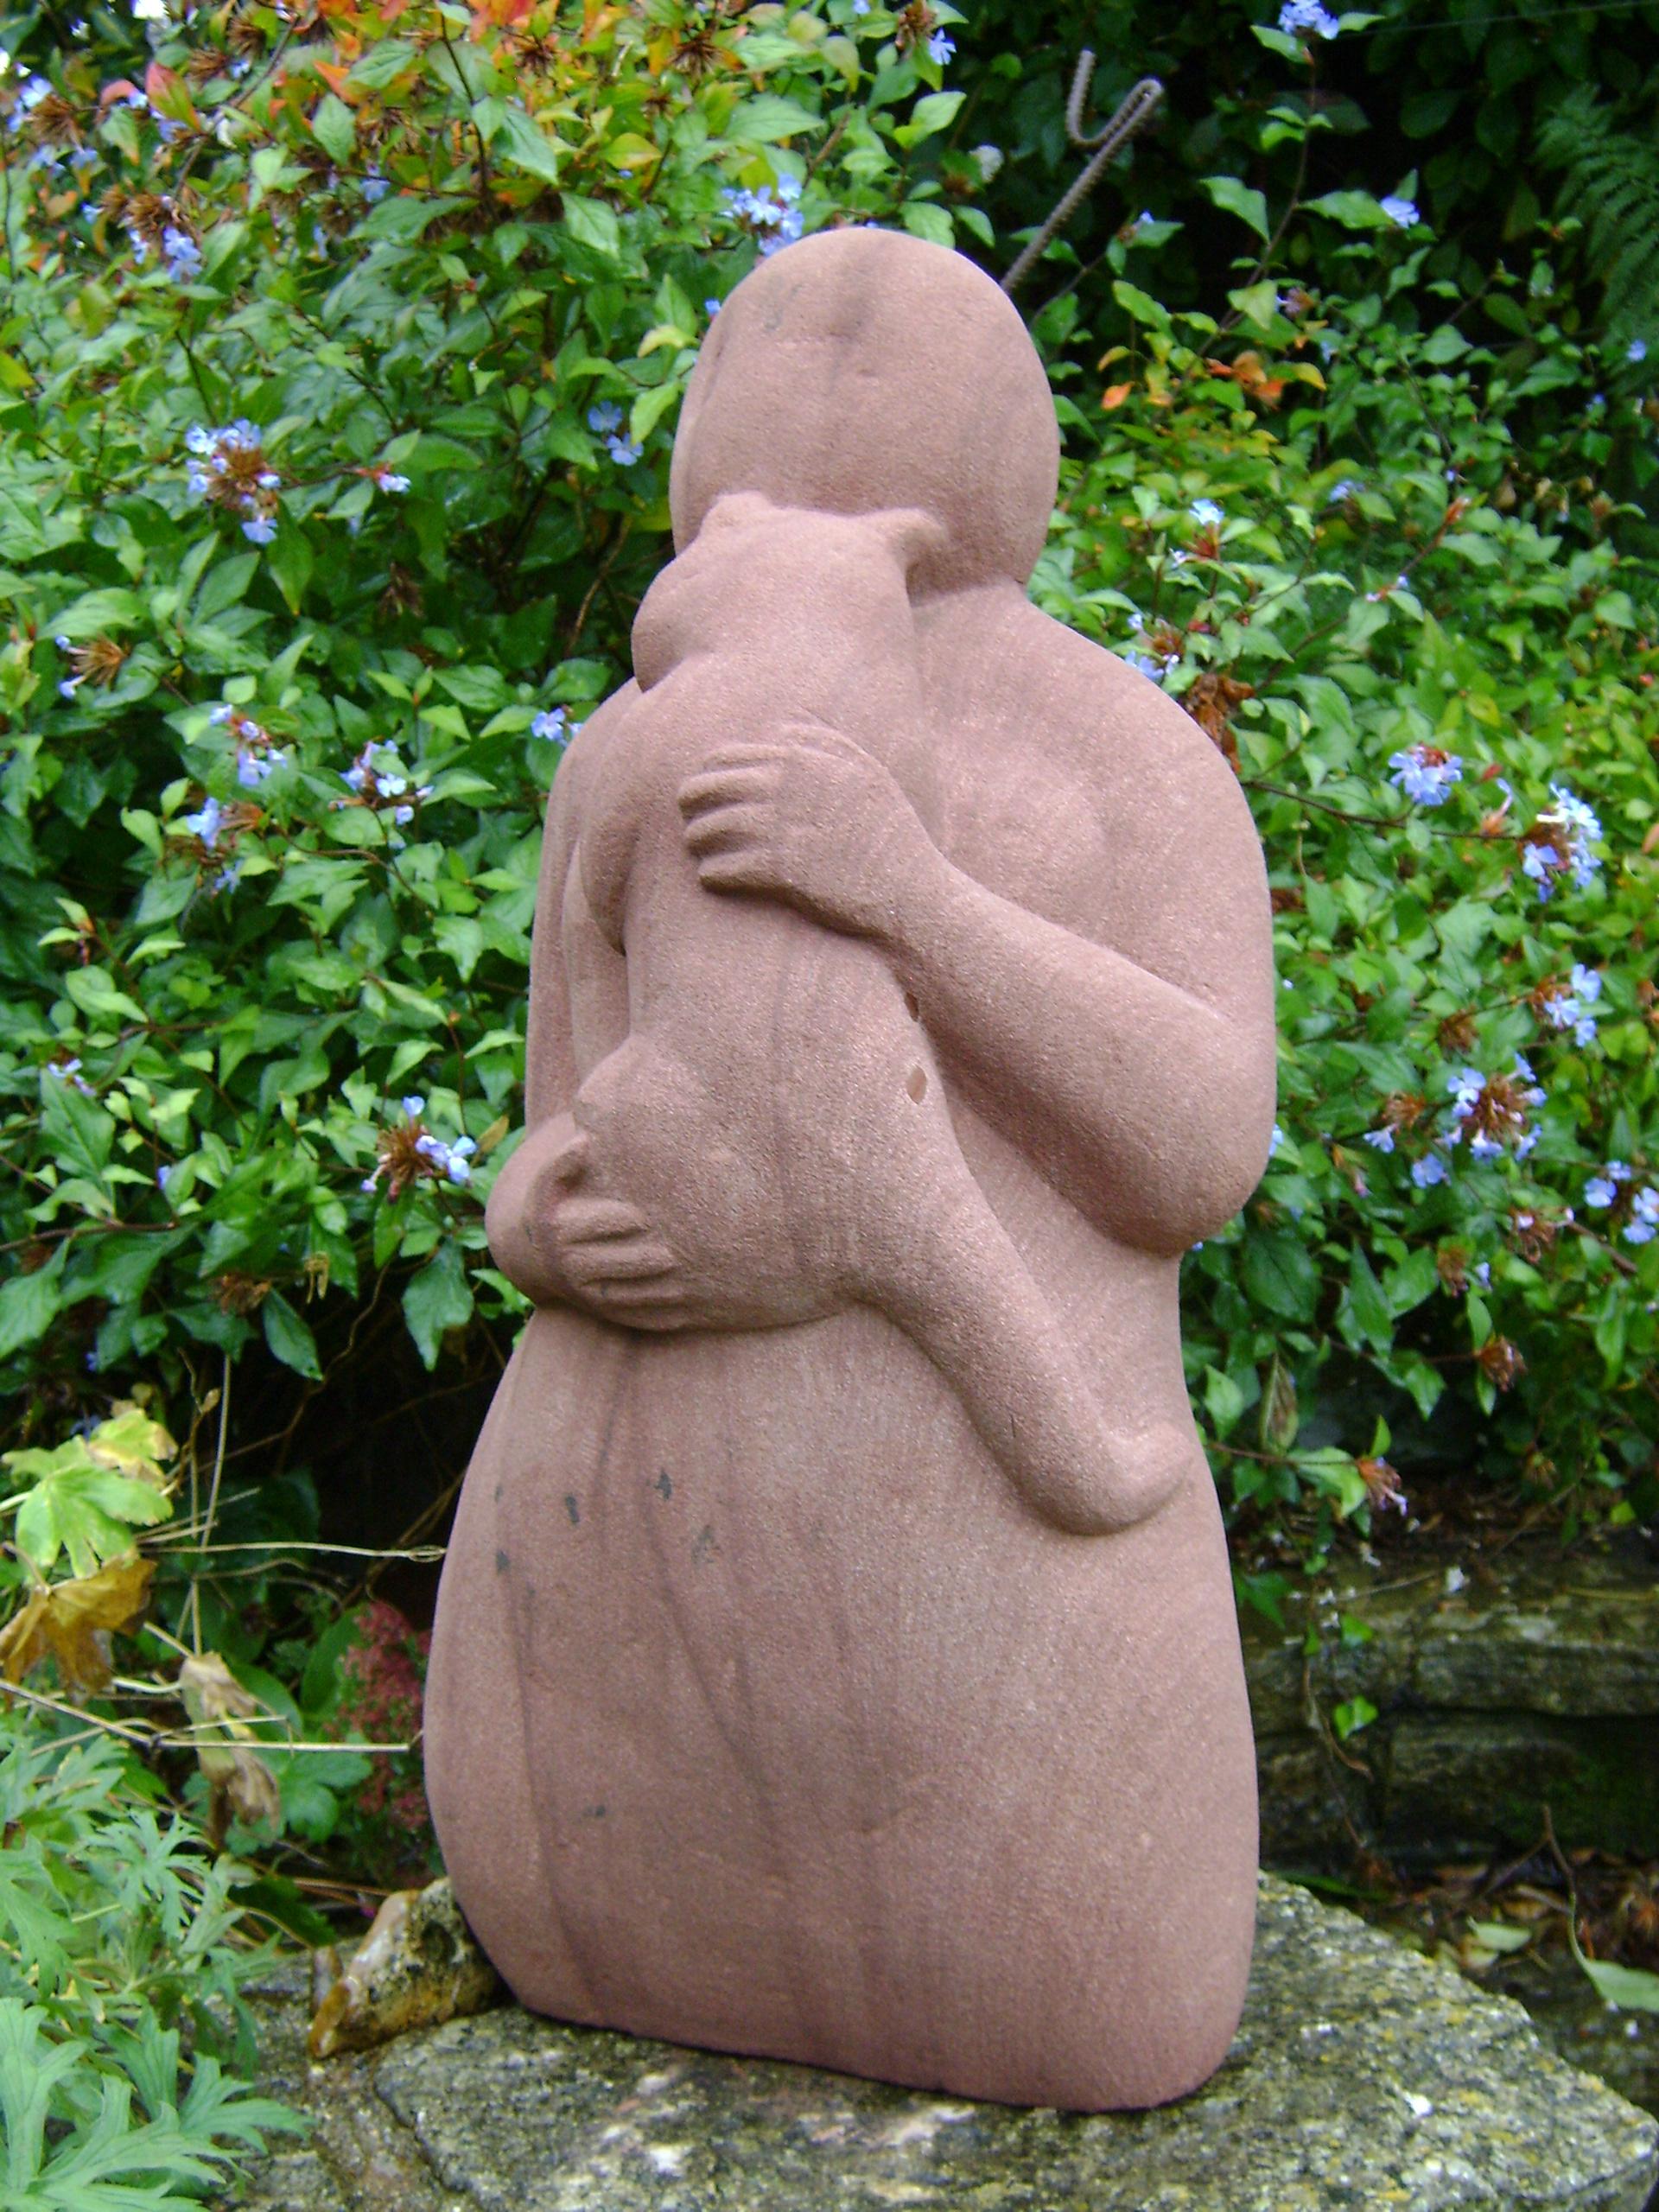 garden rw seik serene angelika statue cat